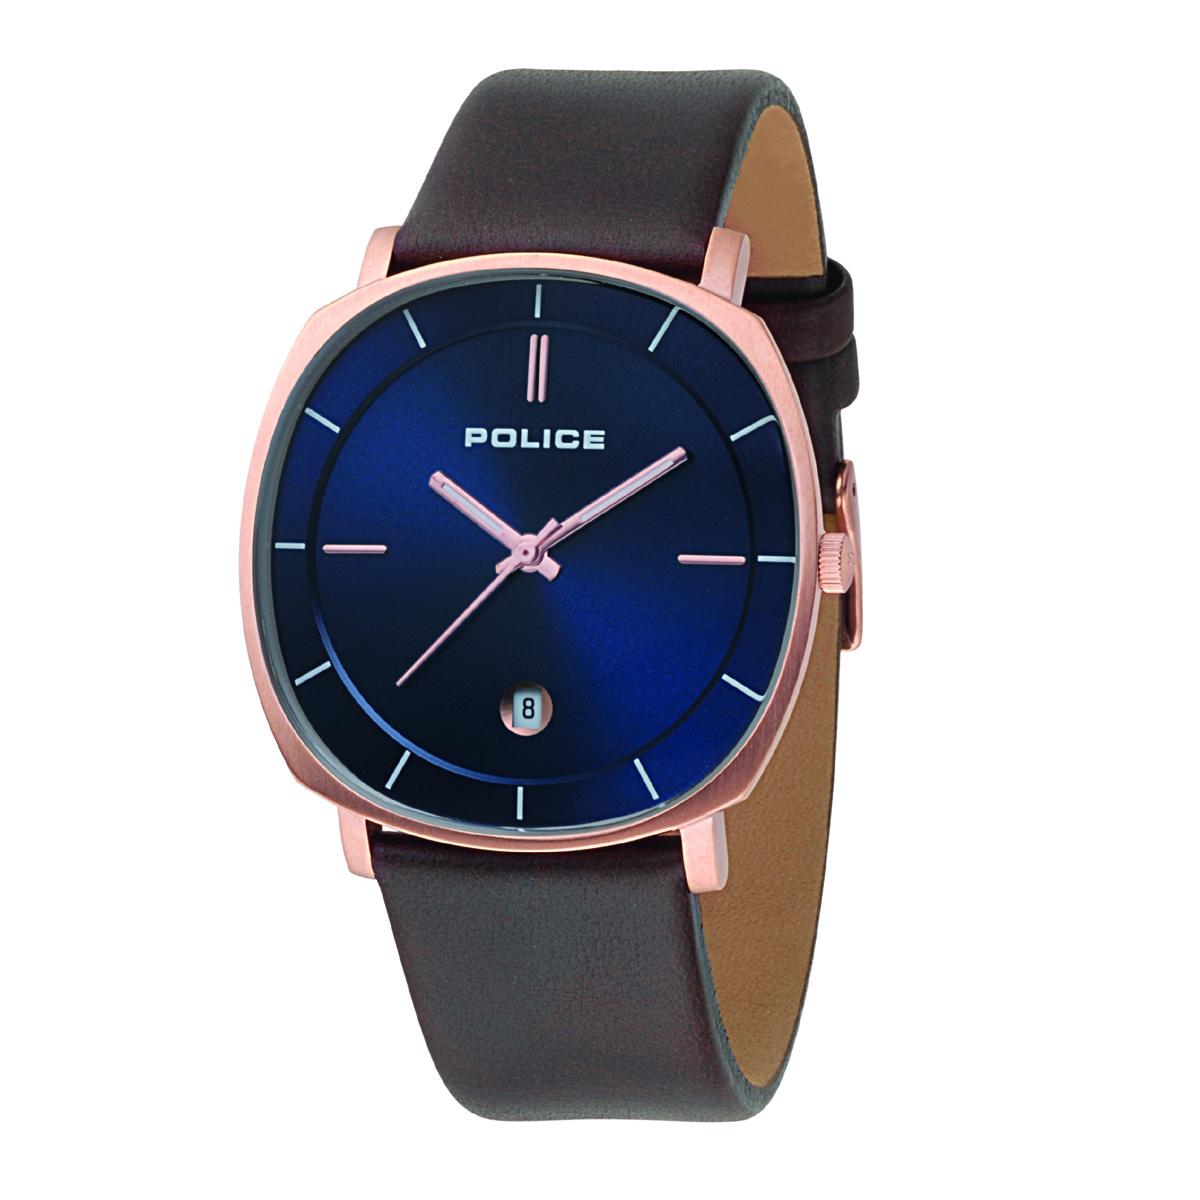 POLICE(ポリス)時計 EPICエピック ブルー【15099JSR-03】